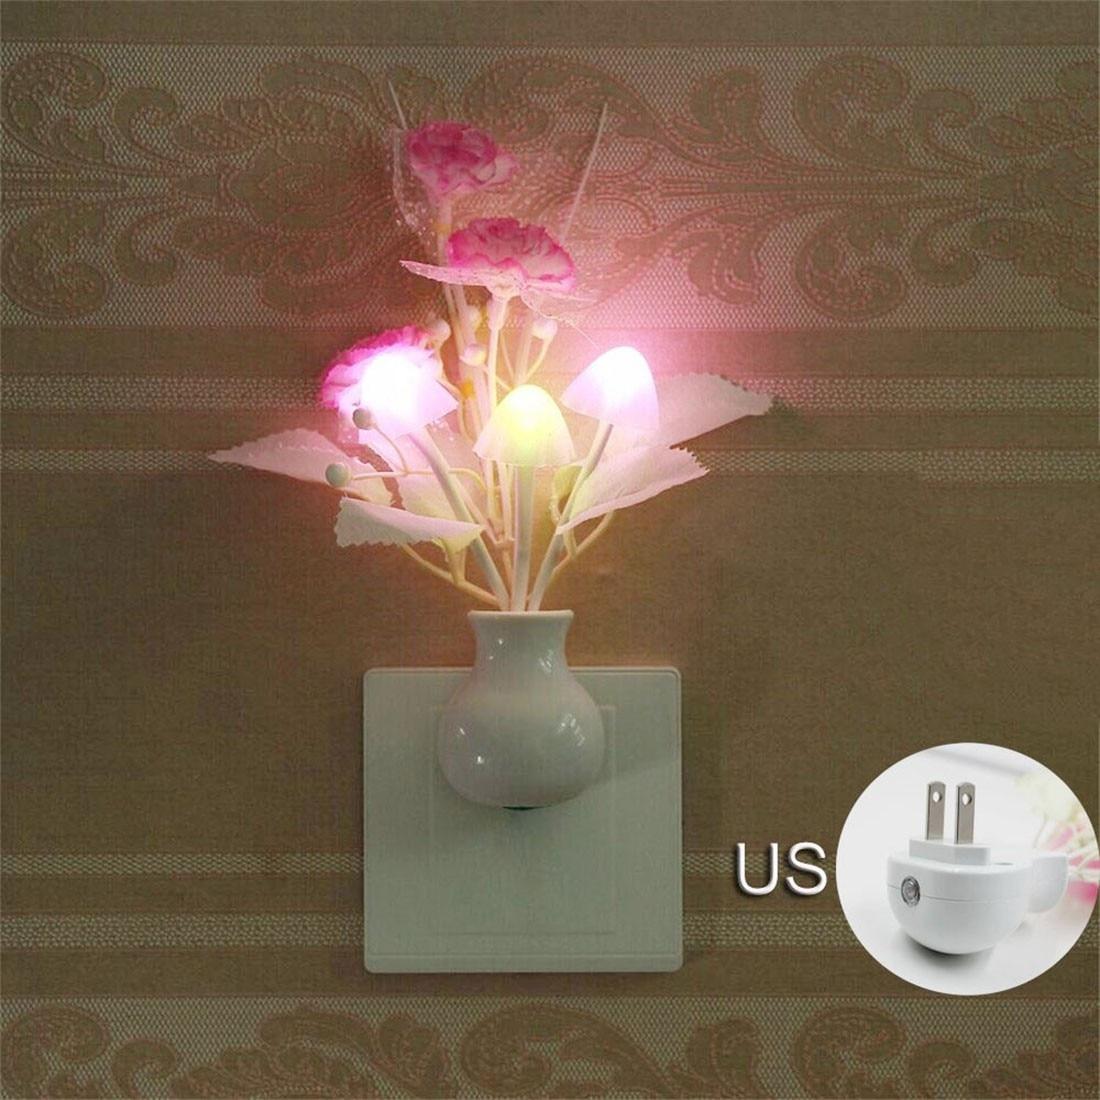 Colorful Nightlights 110V US Plug Mushroom Rose Light Sensor Lamp LED Night Light Lamp Home Bedroom Decoration For Baby Kids